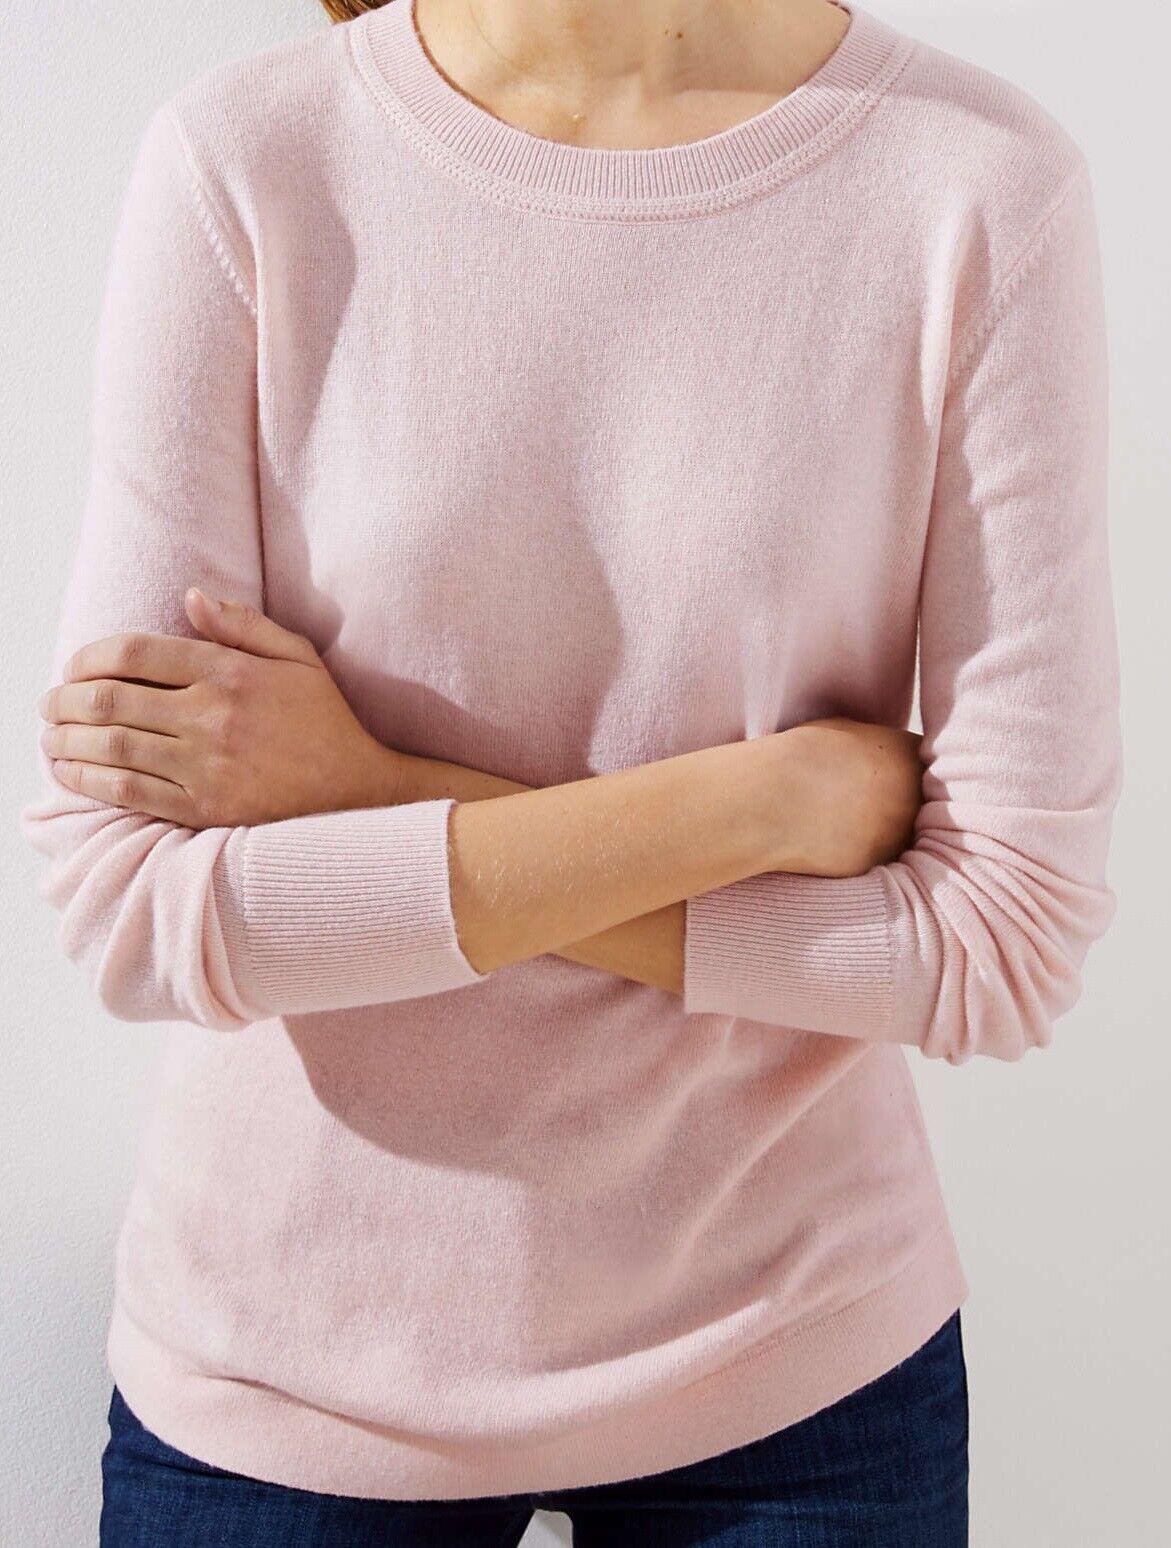 a05310bccfc Ann Taylor LOFT Shirttail Sweater Size Large, X-Large NWT Light Pink Cloud  color